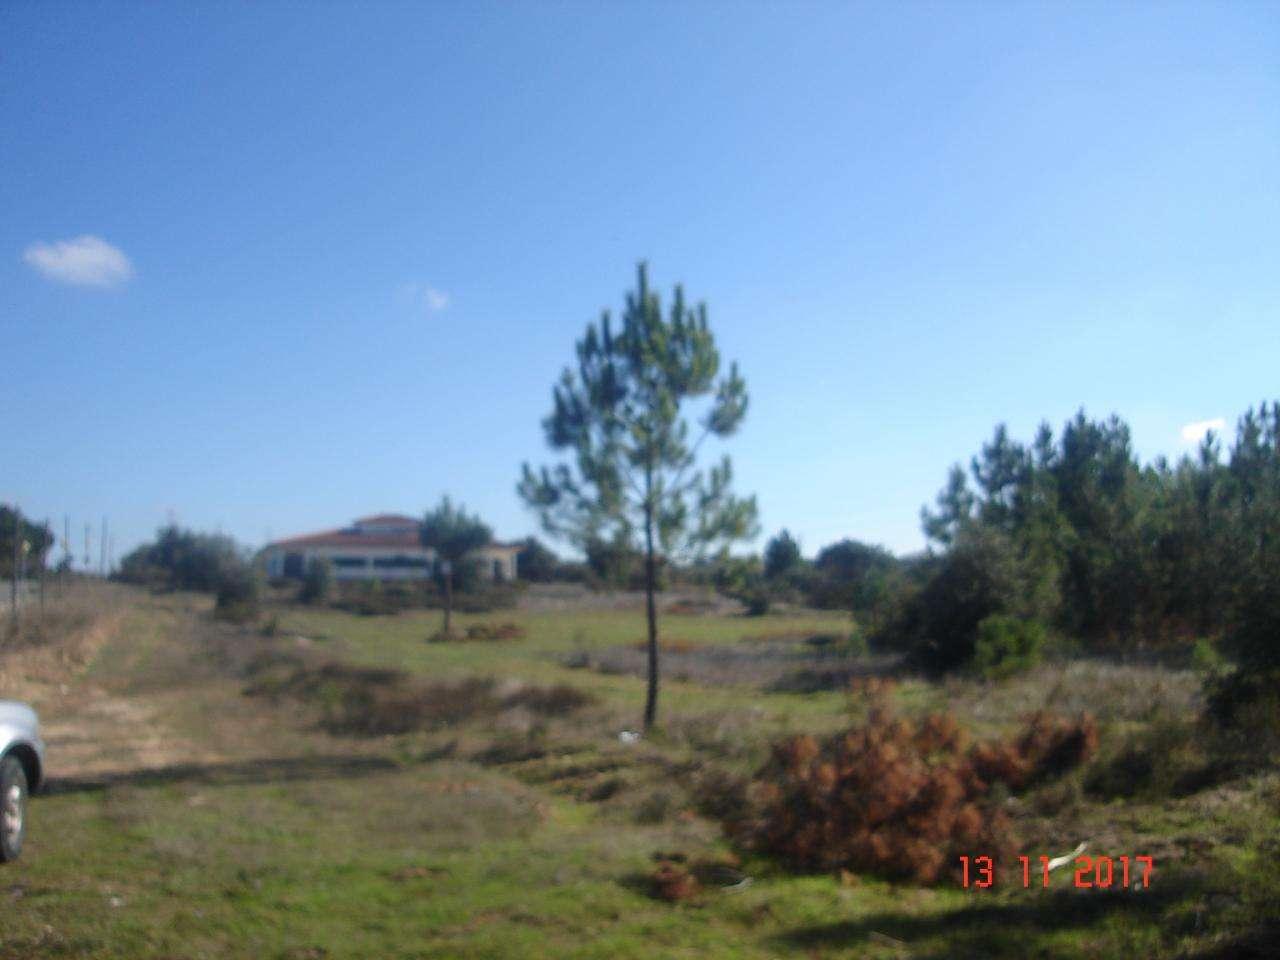 Terreno para comprar, Quinta do Anjo, Palmela, Setúbal - Foto 7